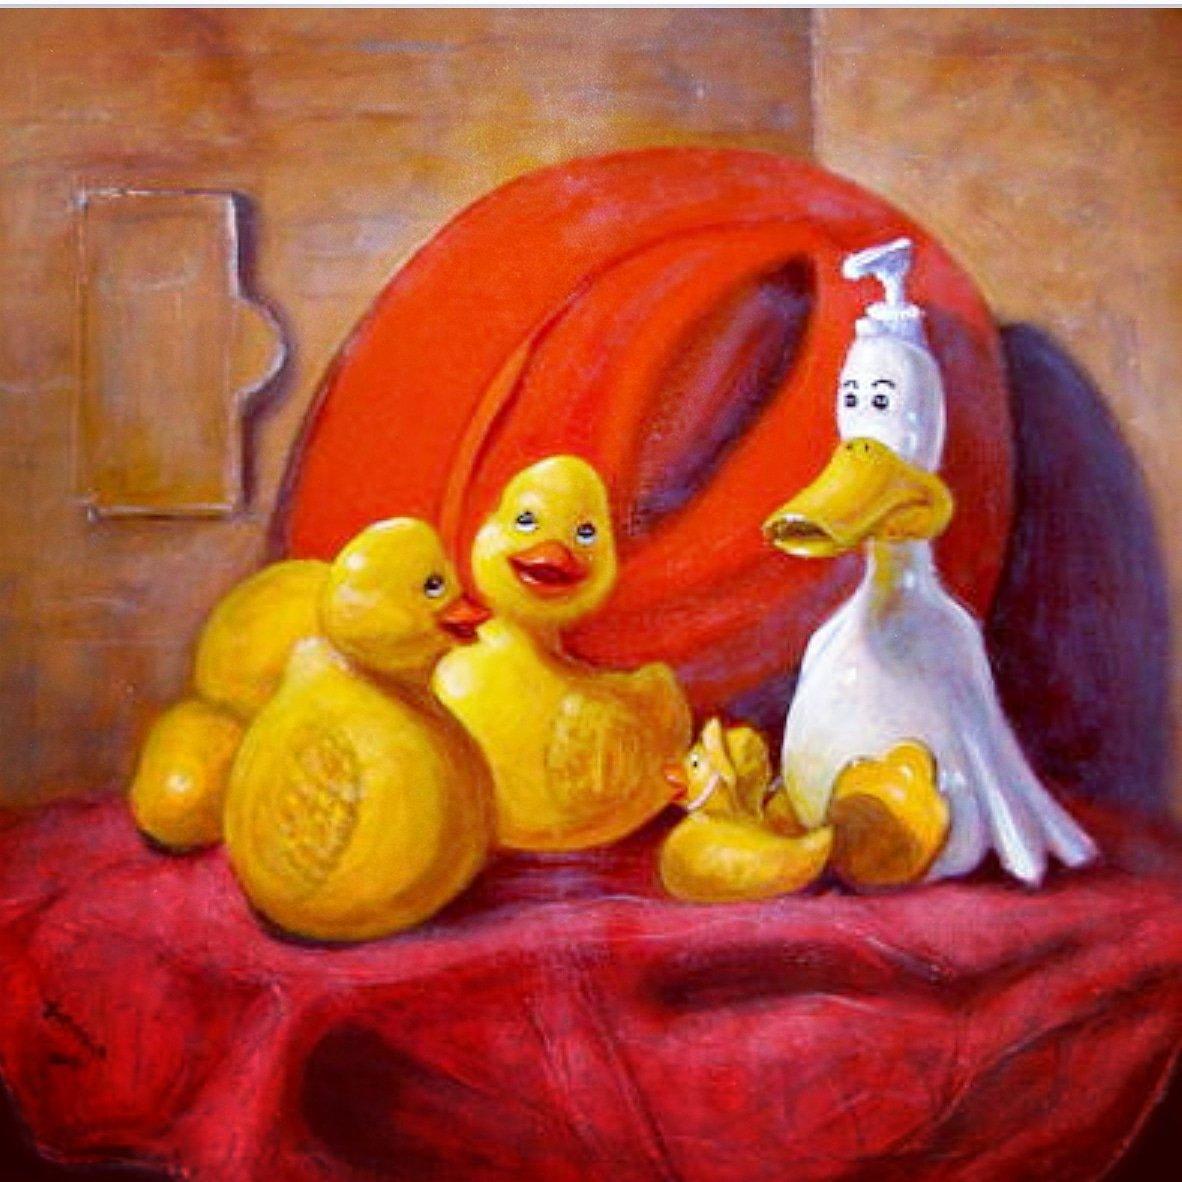 Duck Soap With Red Hat  by Donelli Dimaria     #ducksofart #artastic #print #thursday #artprint #paint #canvas #canvaspainting #stilllife #funart #artlove #likeit #loveit #art4life #artparade #artist #colorfulart #animalart #originalart #artclub #artinfo #artgallery<br>http://pic.twitter.com/O2VFNky6wt